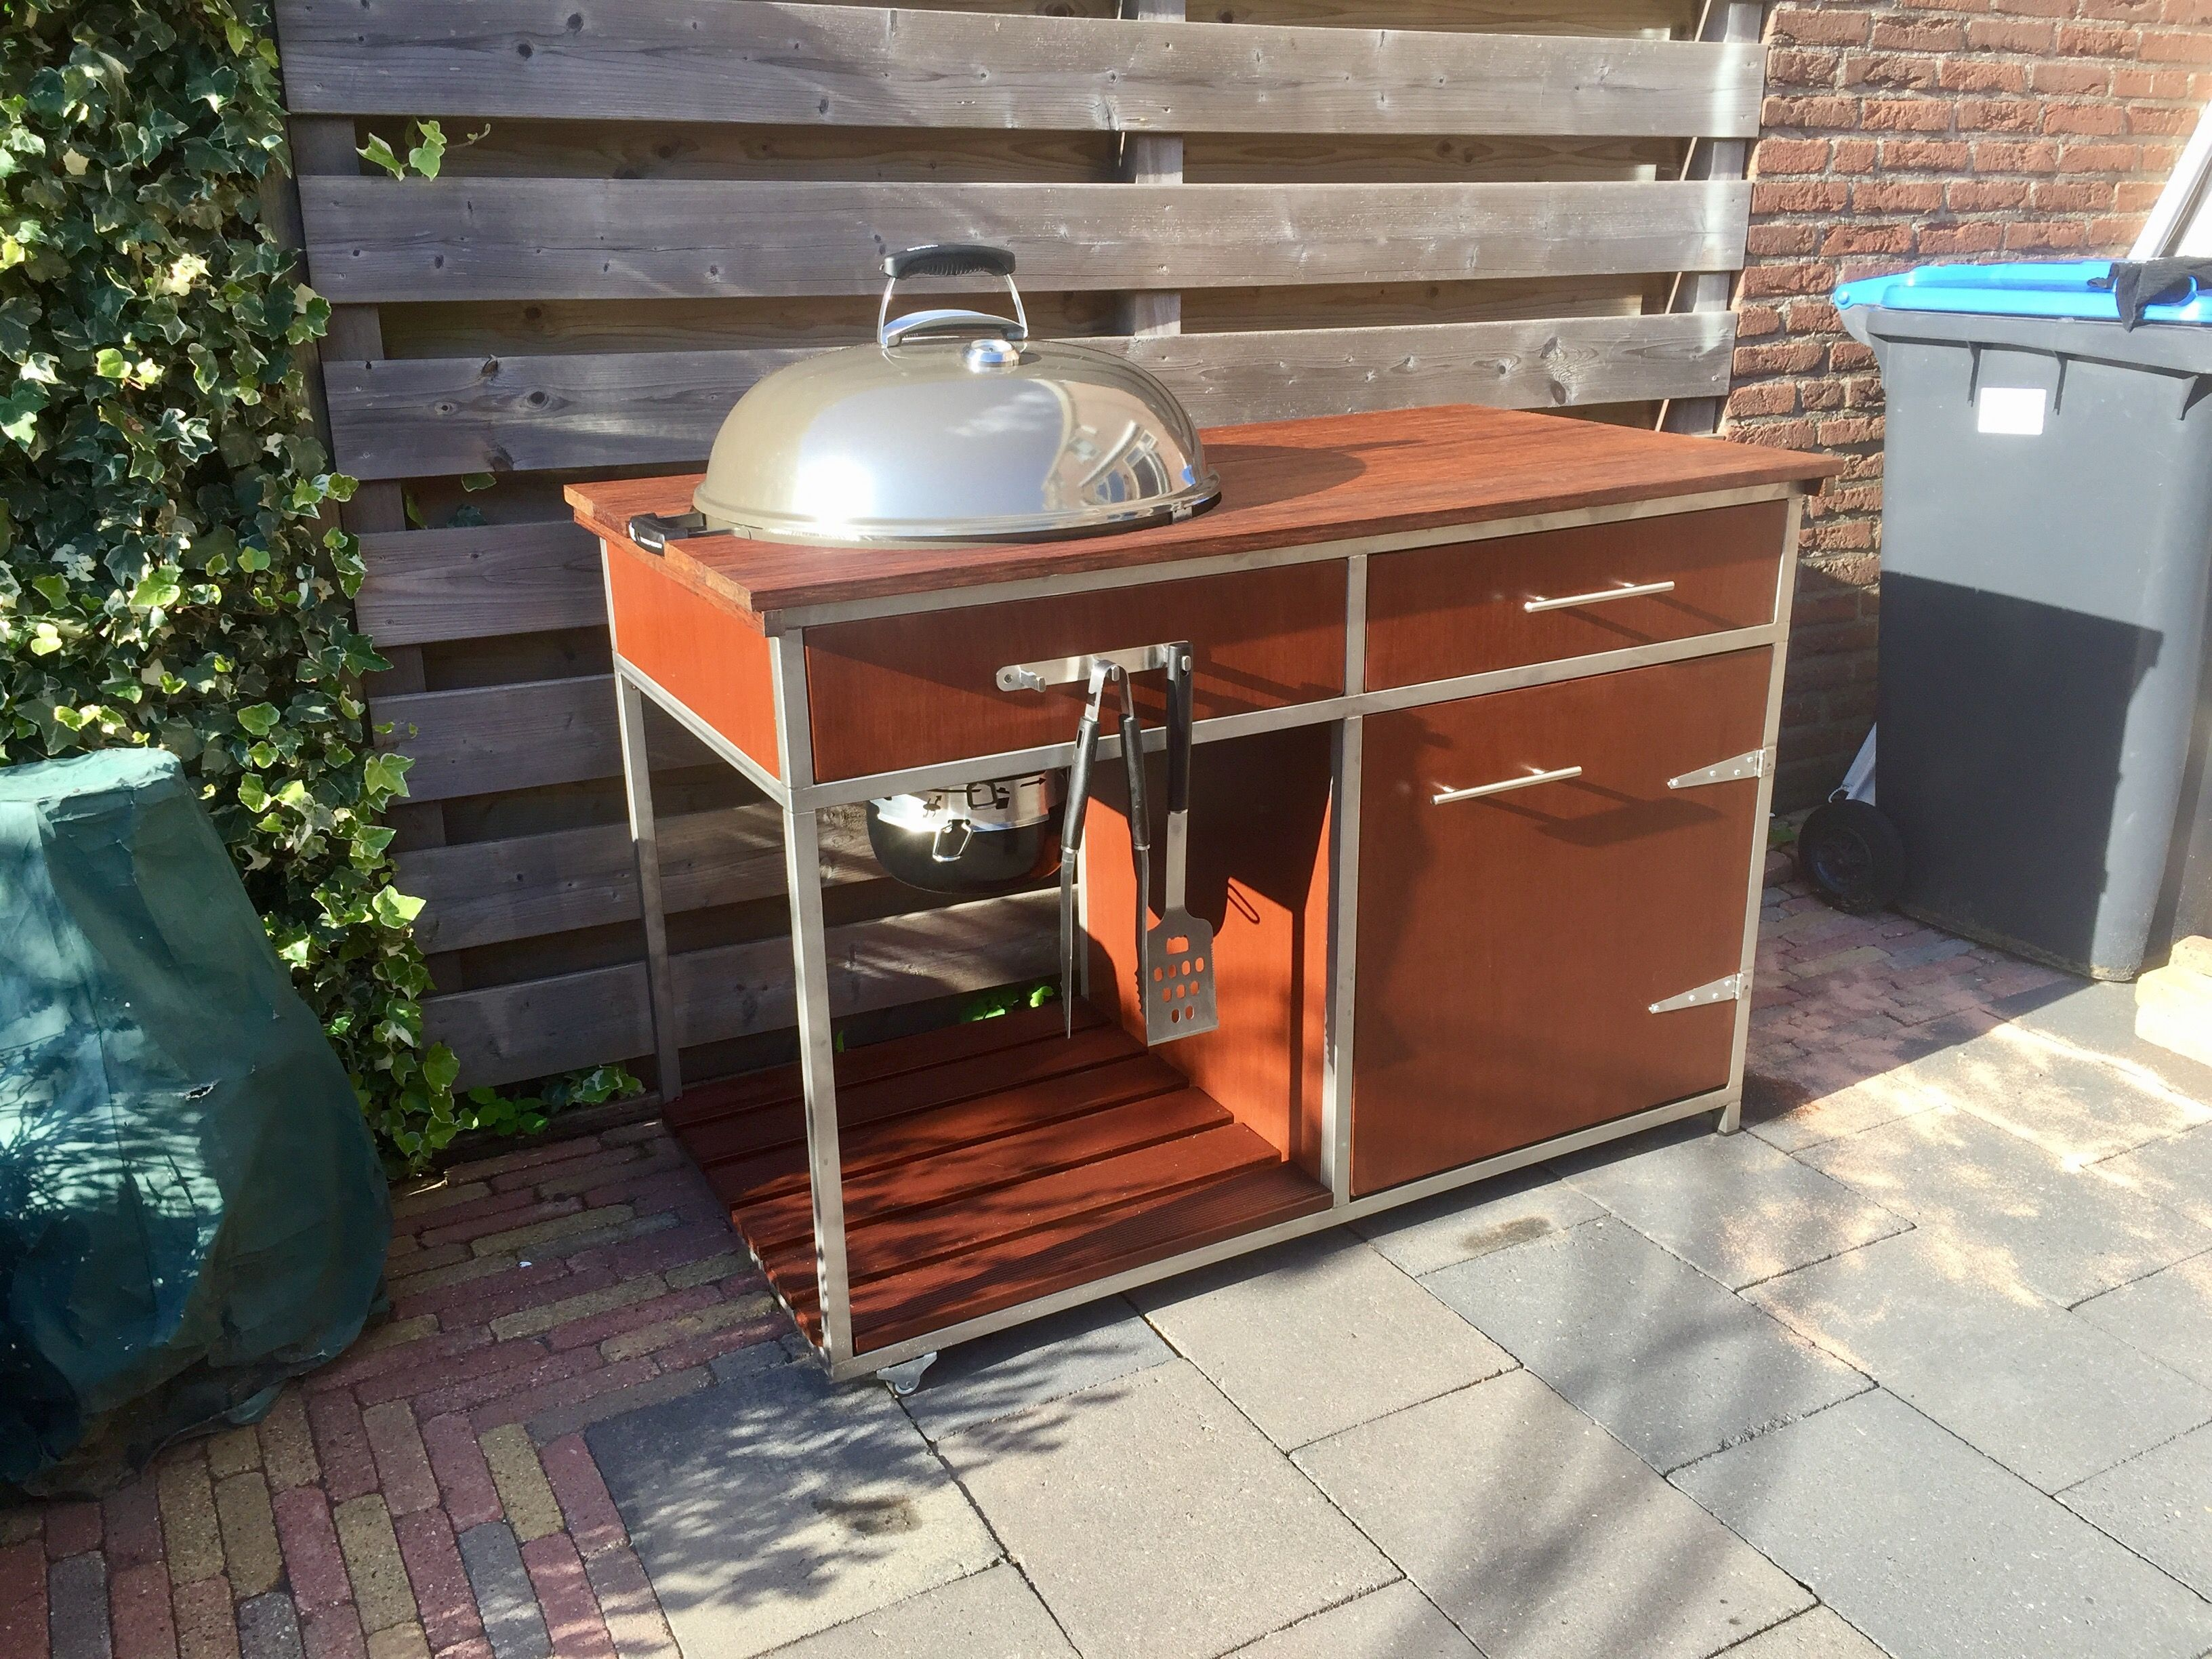 Outdoor Küche Weber Spirit : Weber grill in outdoor küche integrieren outdoorküche gemauert mit